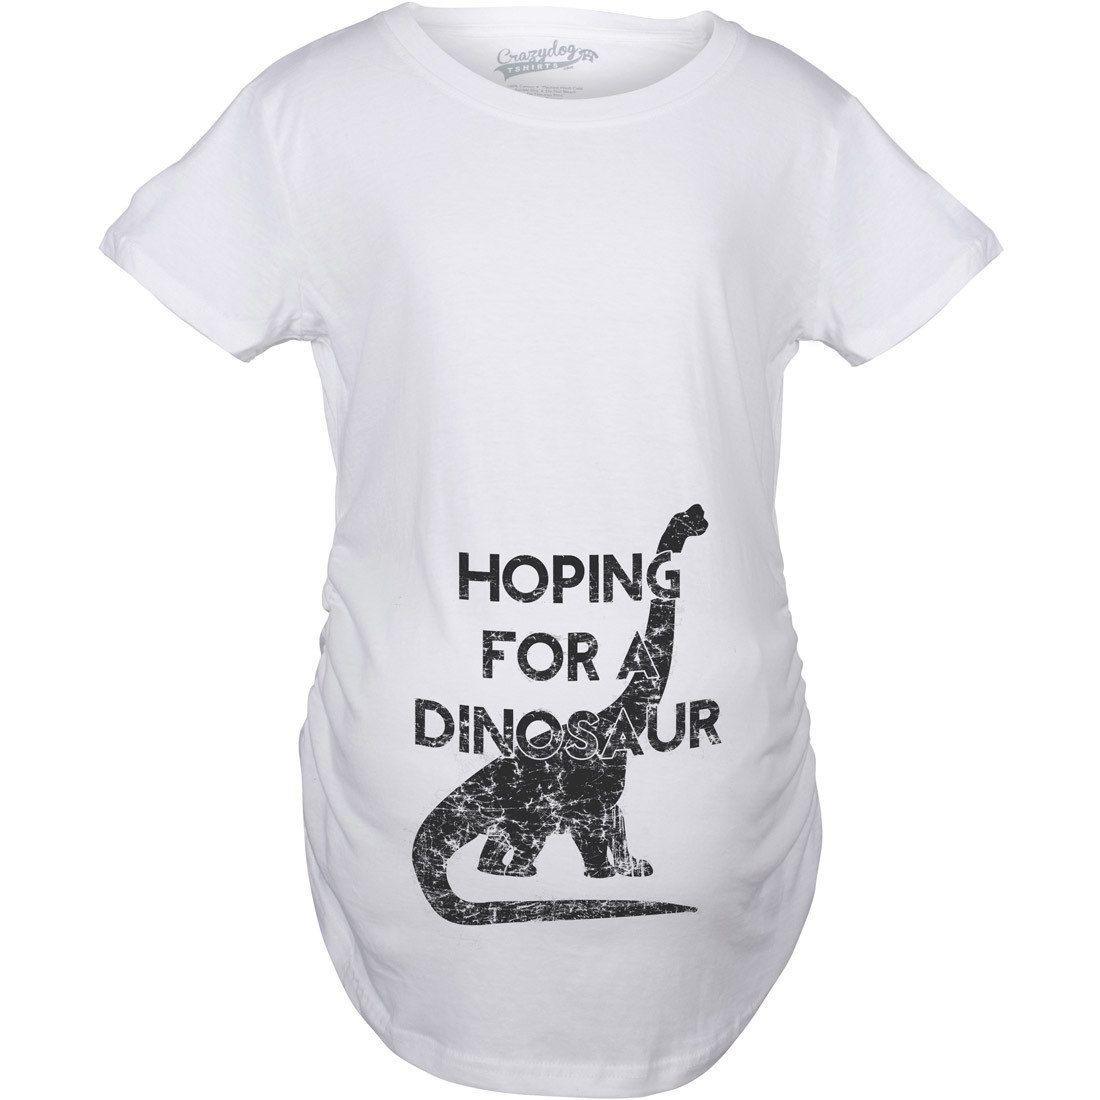 02de3511 Maternity Hoping For a Dinosaur T-shirt (XXL), Women's, White (printed)